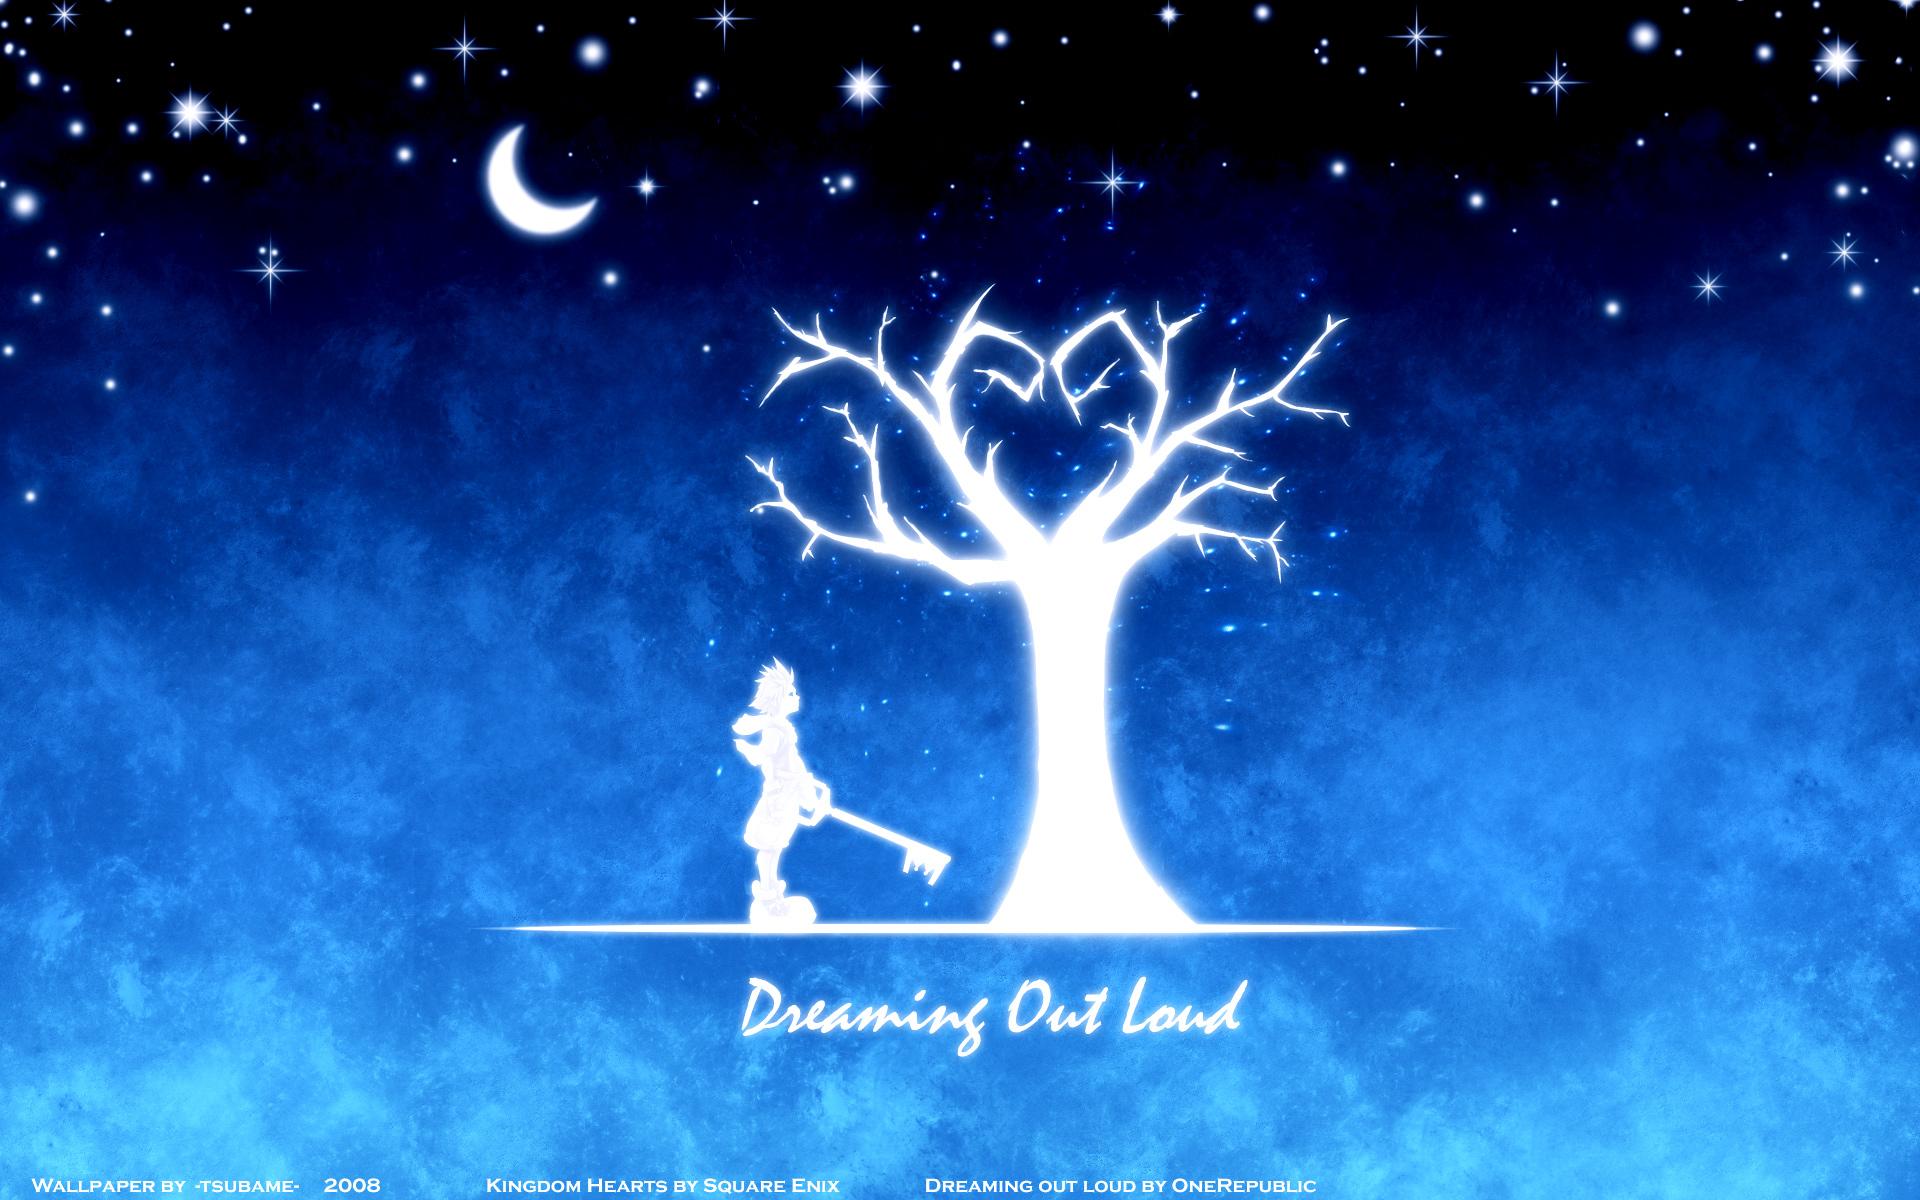 Iphone wallpaper kingdom hearts - Kingdom Hearts Heartless Wallpaper Wallpapersafari